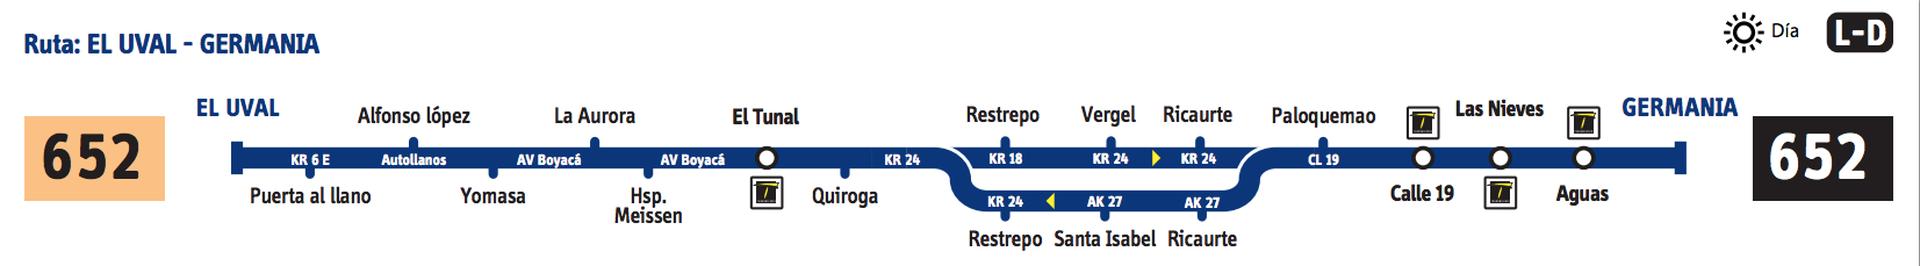 Ruta SITP: 652 Uval ↔ Germania [Urbana] 2